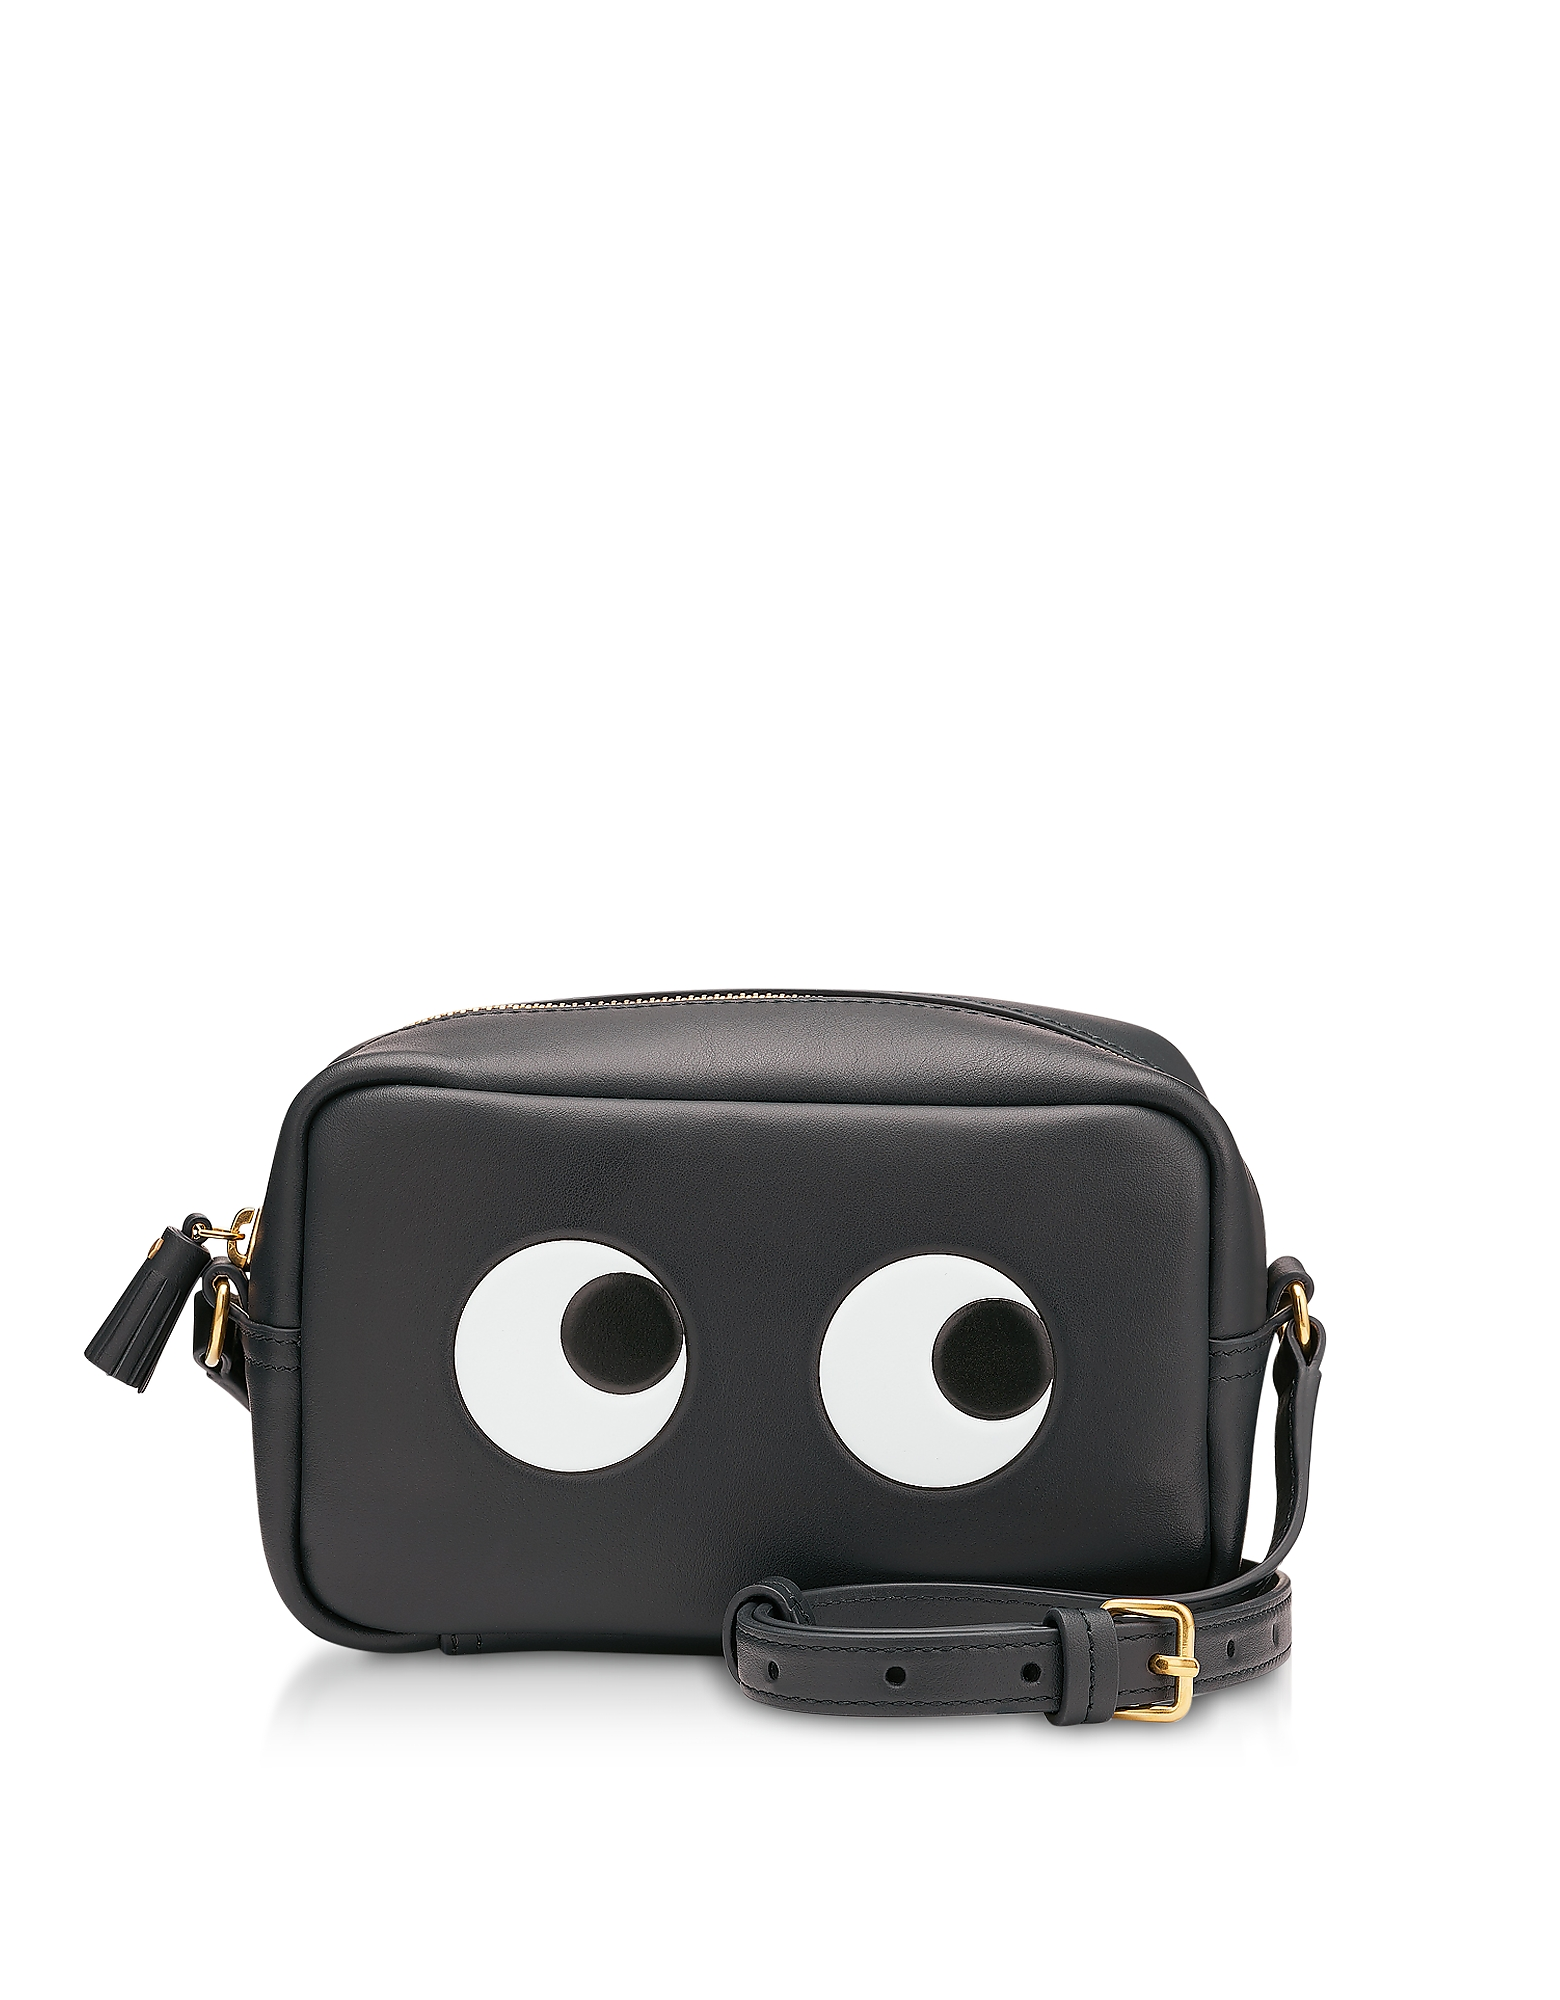 Anya Hindmarch Handbags, Circus Mini Eyes Right Crossbody Bag